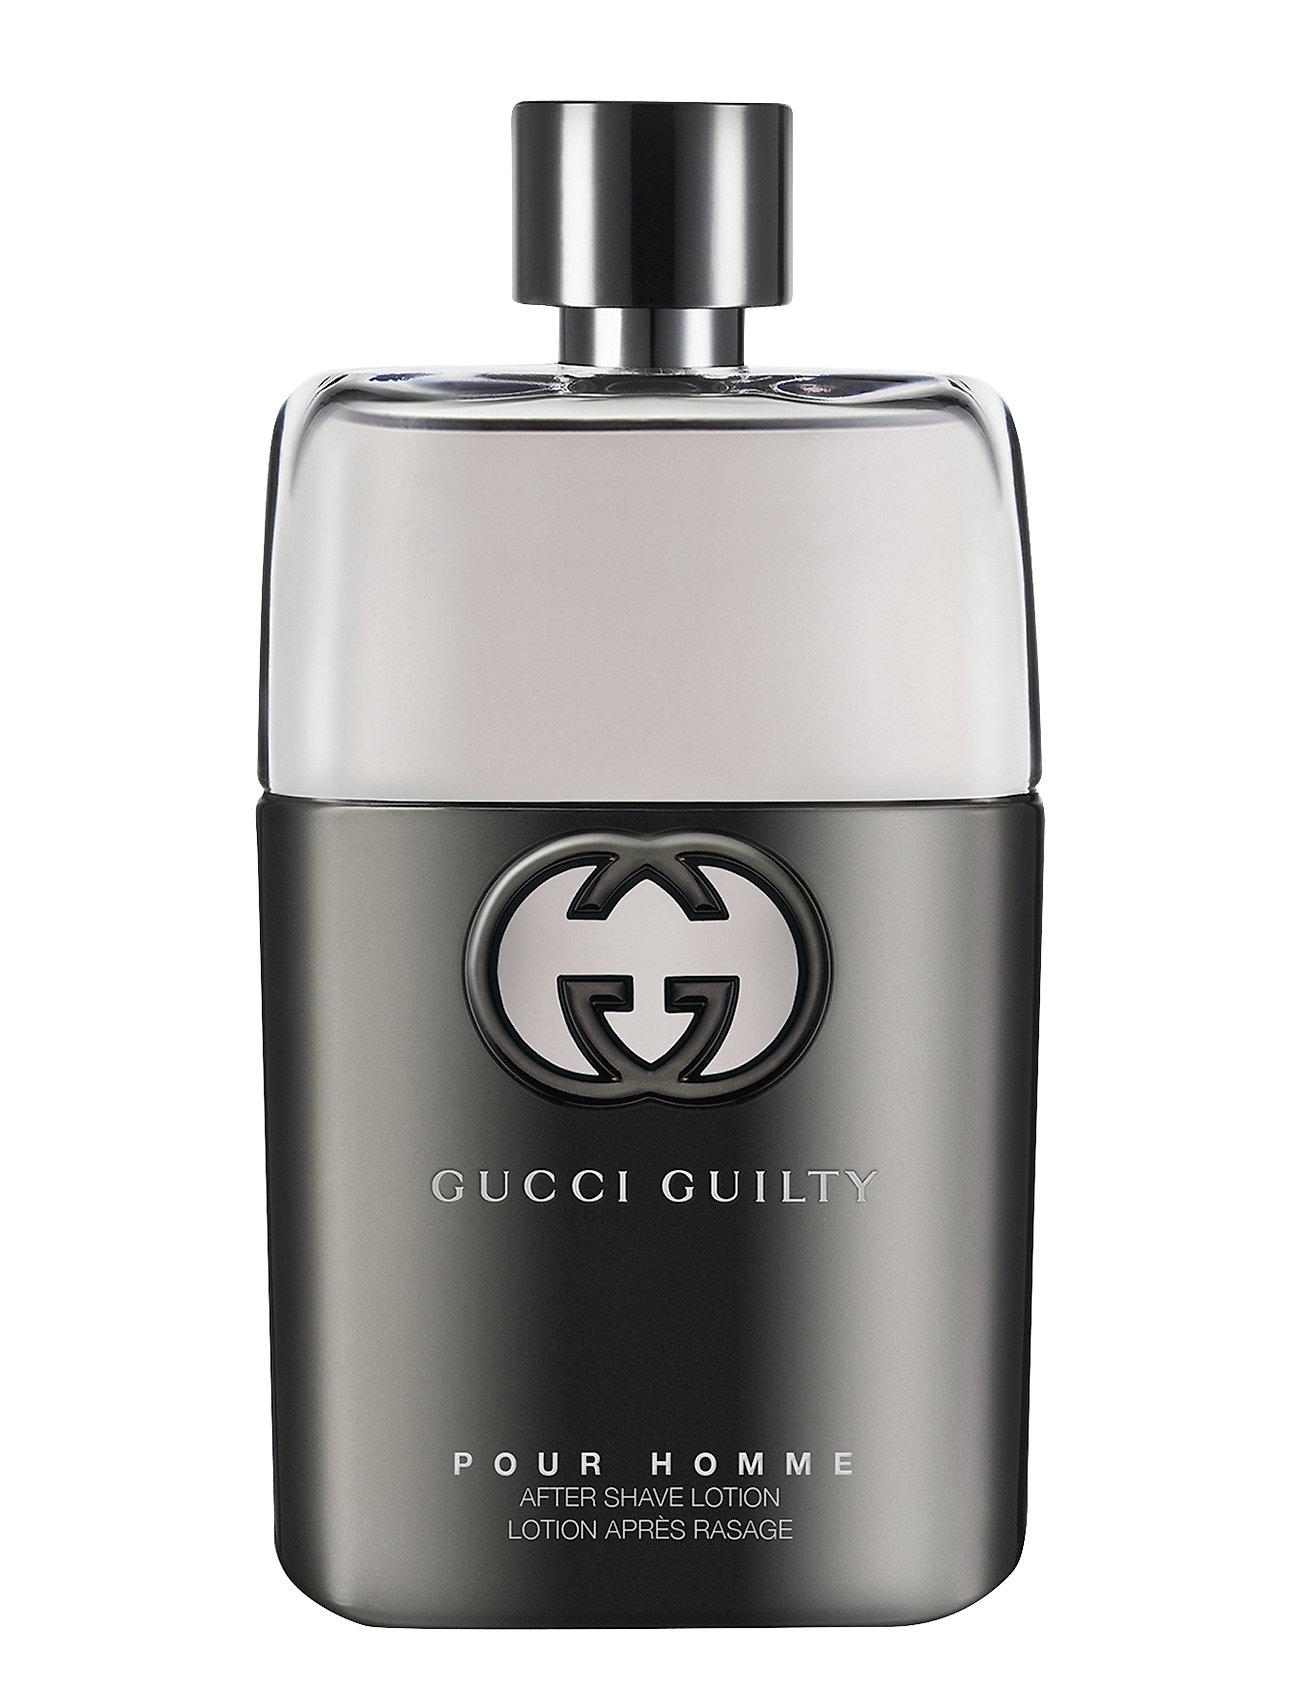 Gucci GUILTY POUR HOMME AFTER SHAVELOTION - NO COLOR